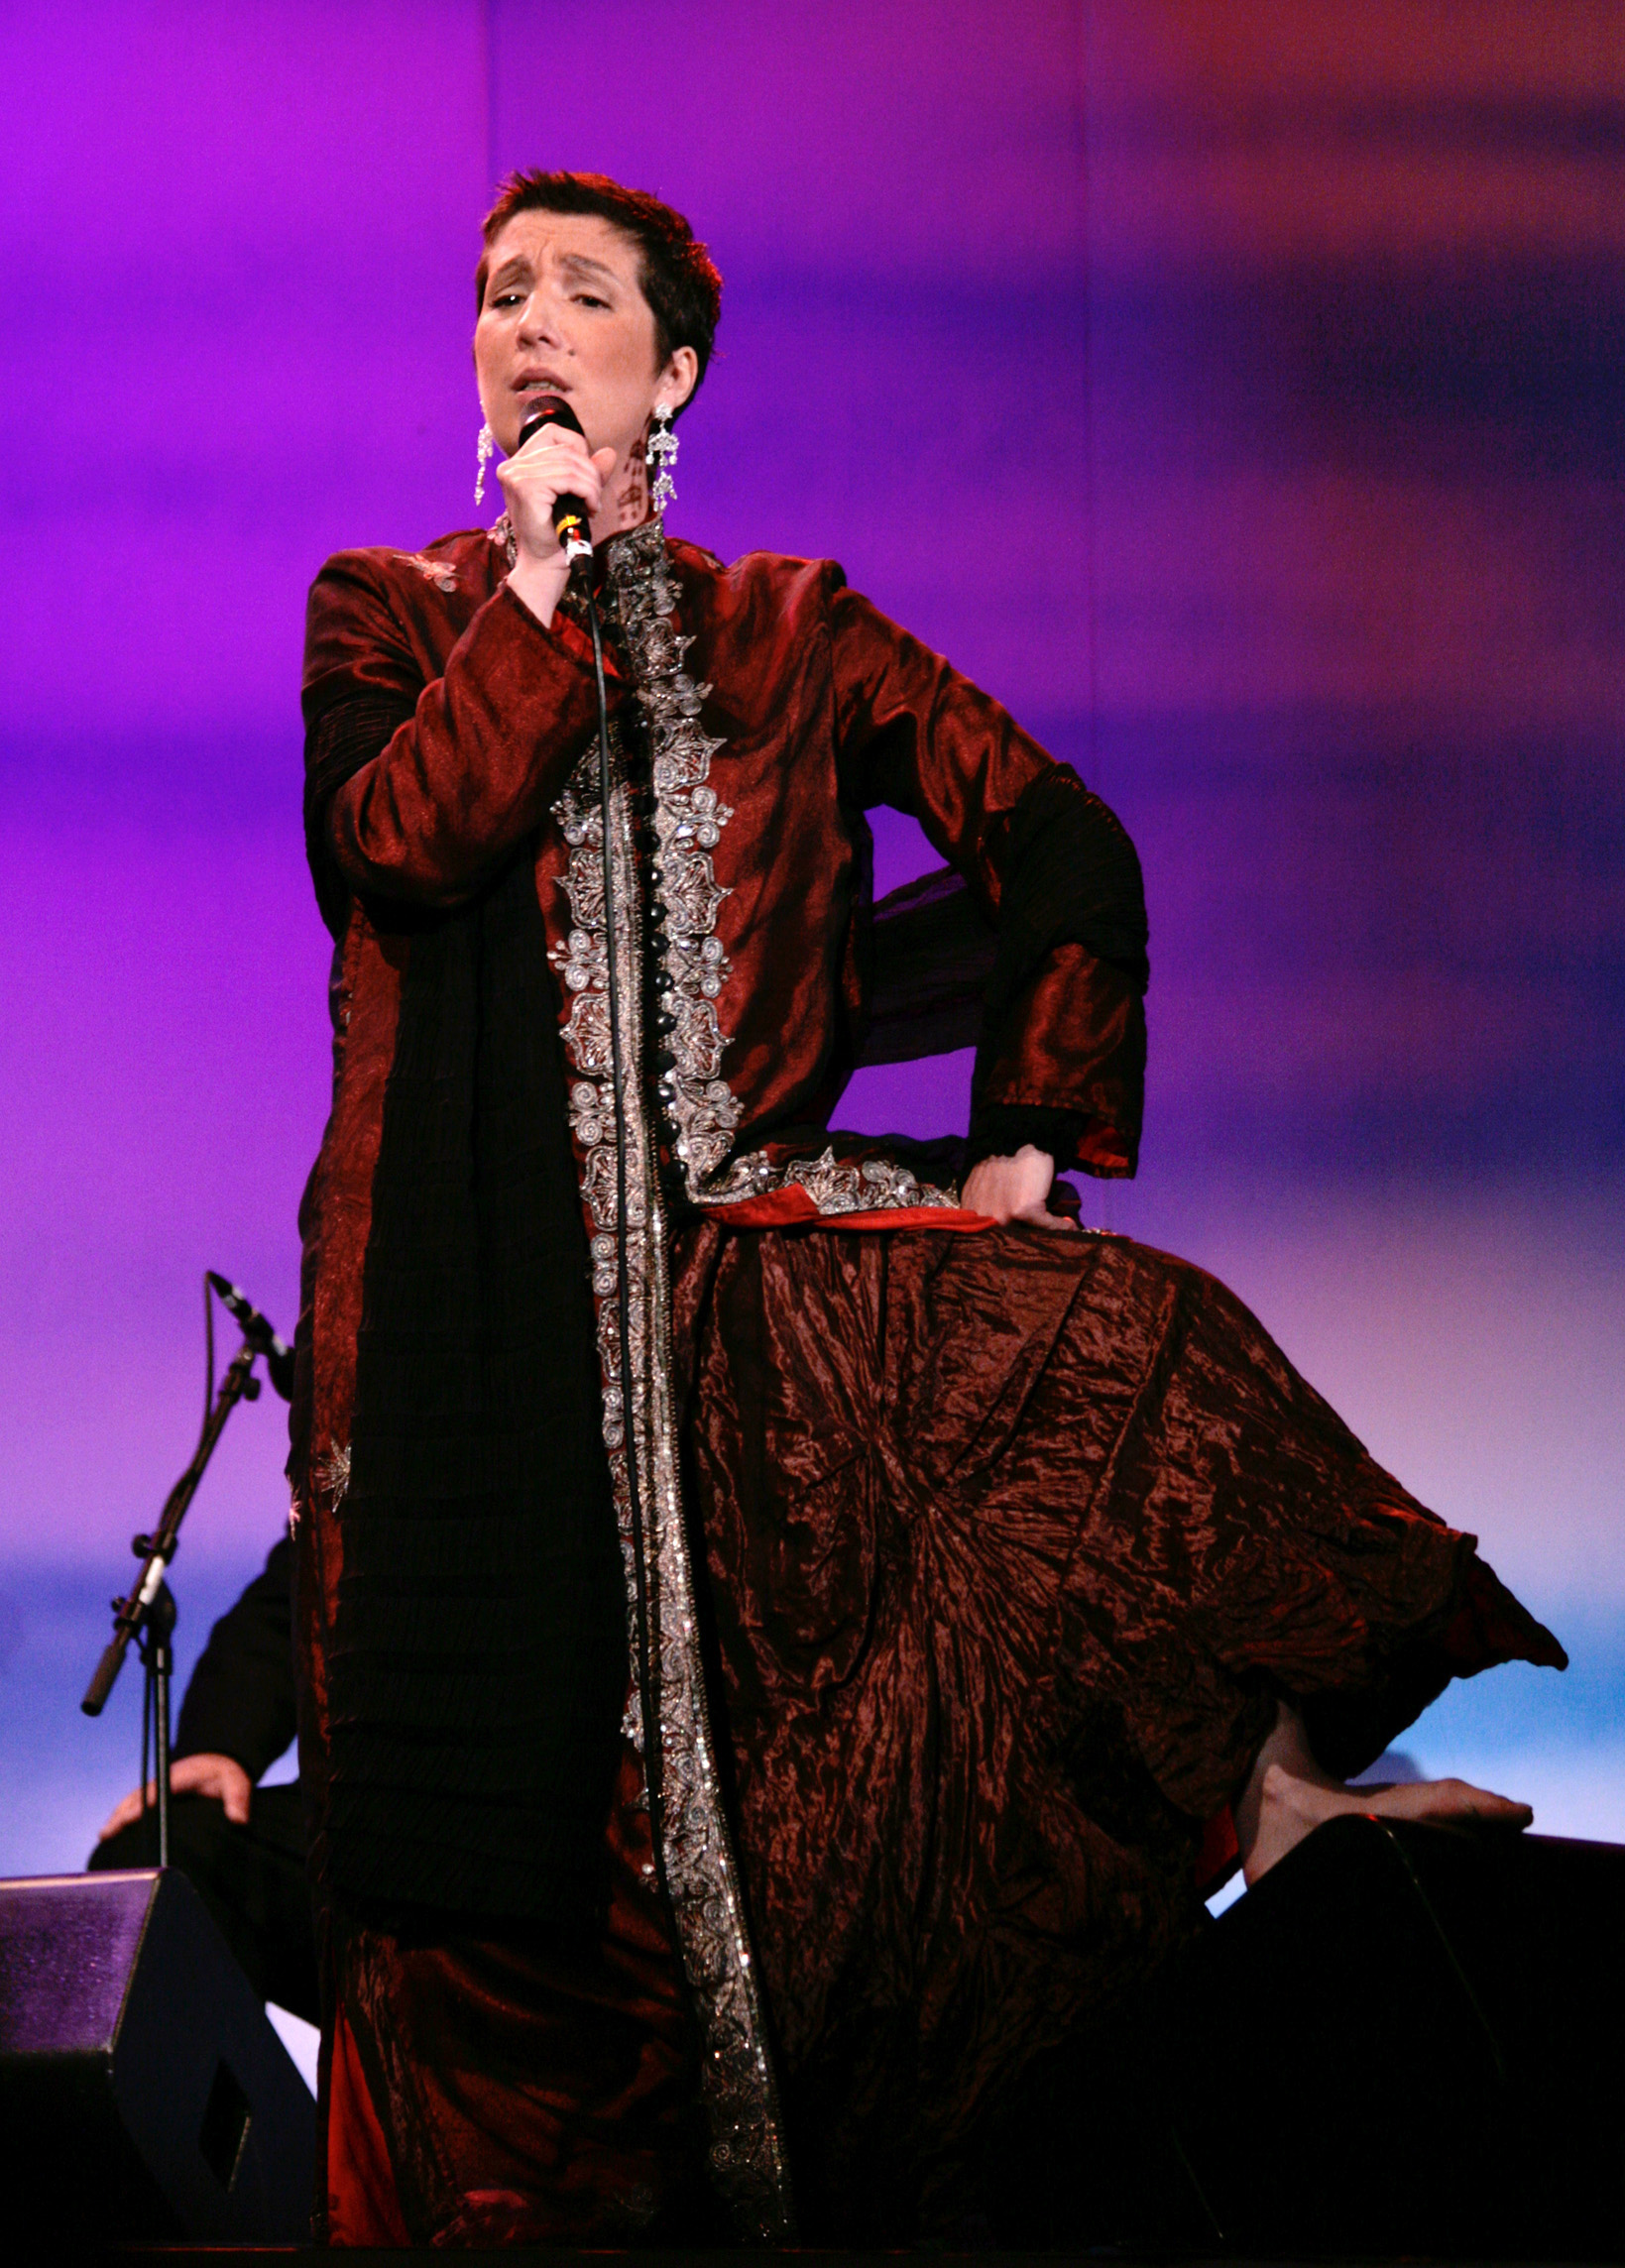 Фадишта Дулсе Понтеш выступает в Вене, 2009. Источник https://upload.wikimedia.org/